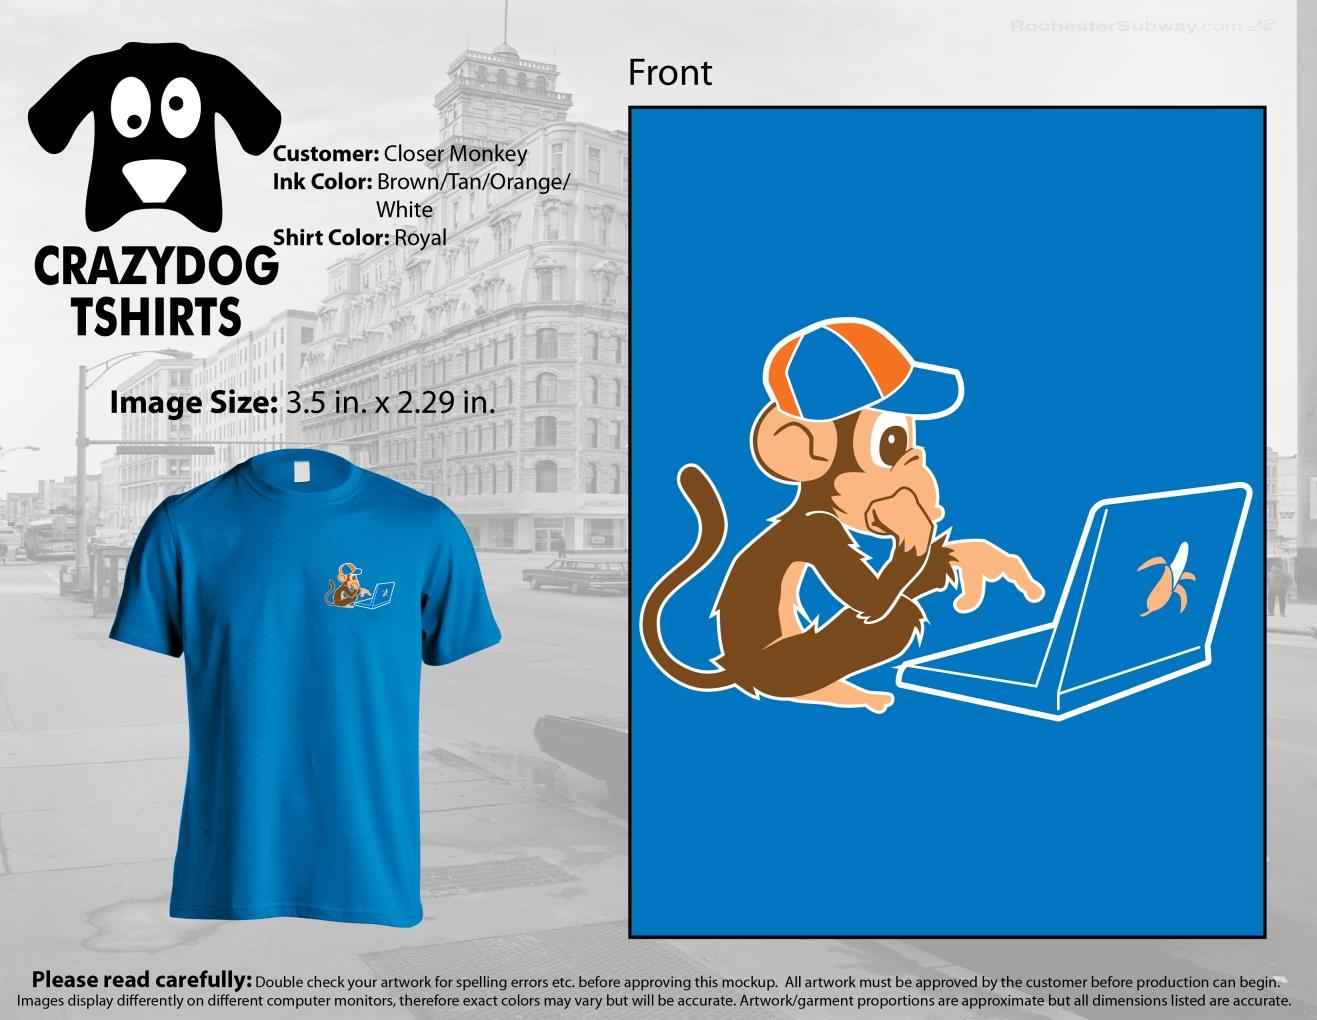 Closer Monkey T-shirt in blue